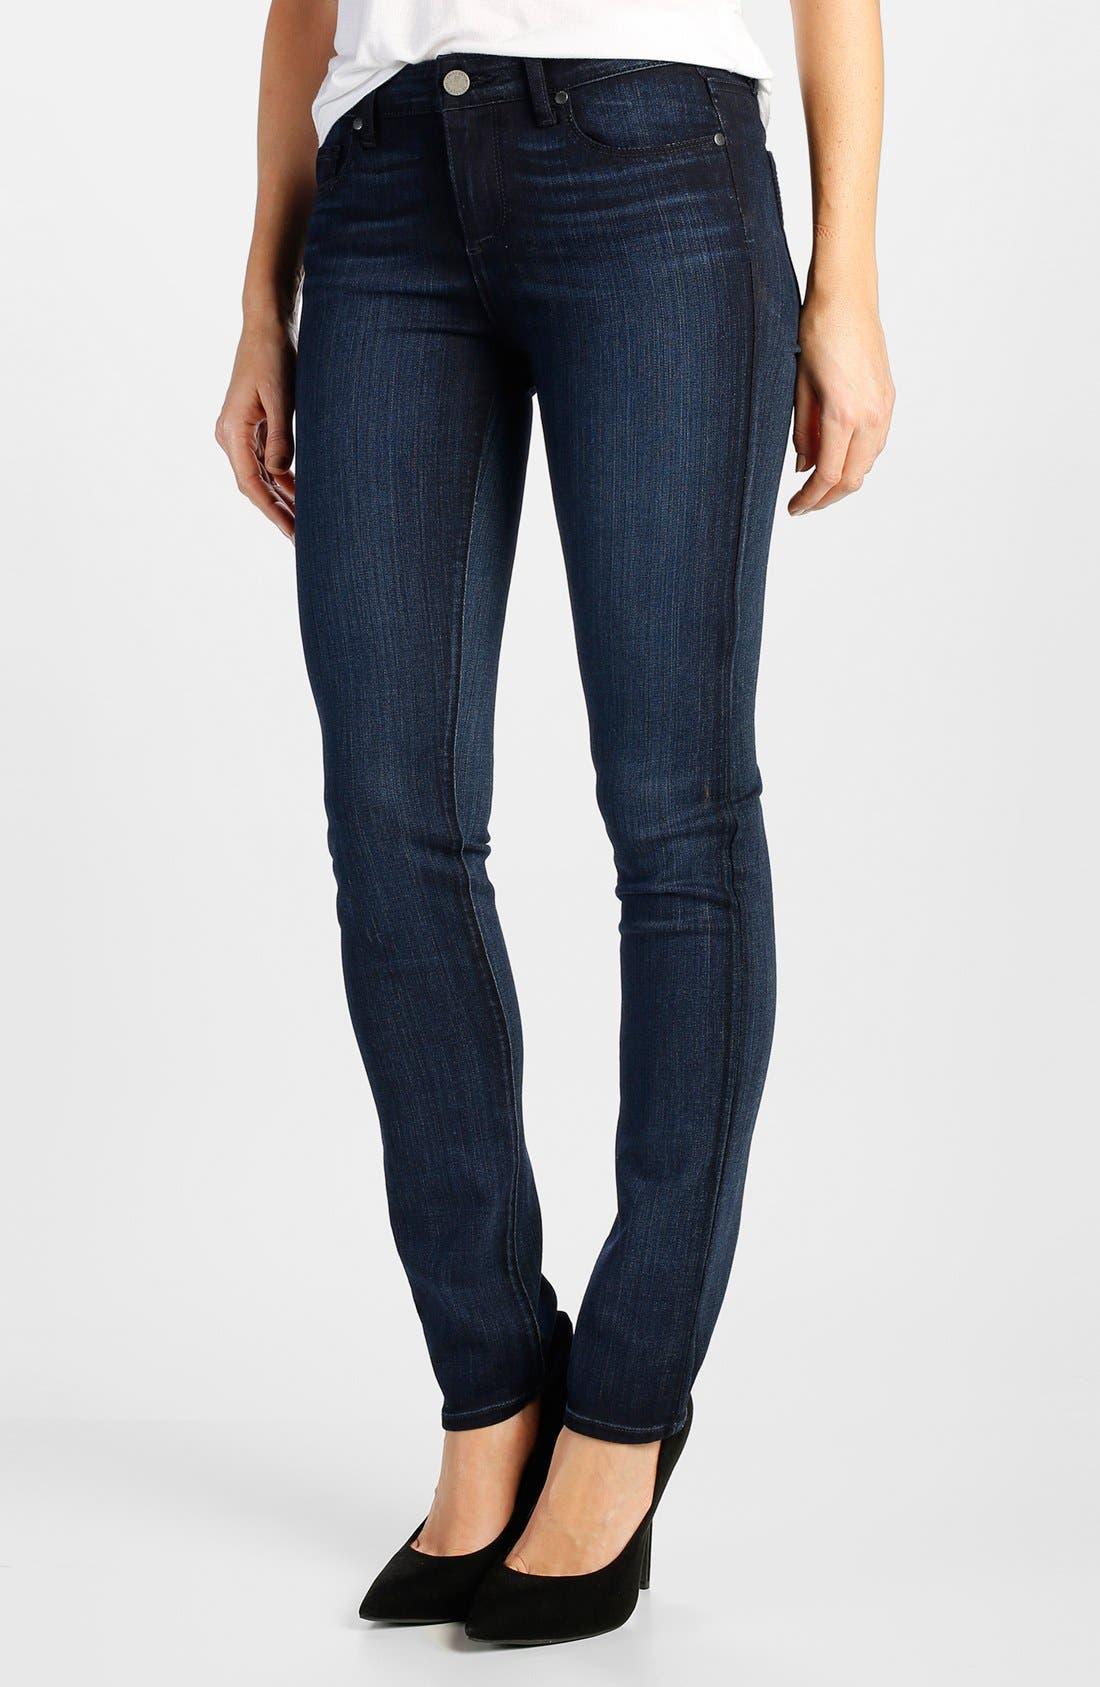 Alternate Image 1 Selected - Paige Denim 'Transcend - Skyline' Skinny Jeans (Georgie)